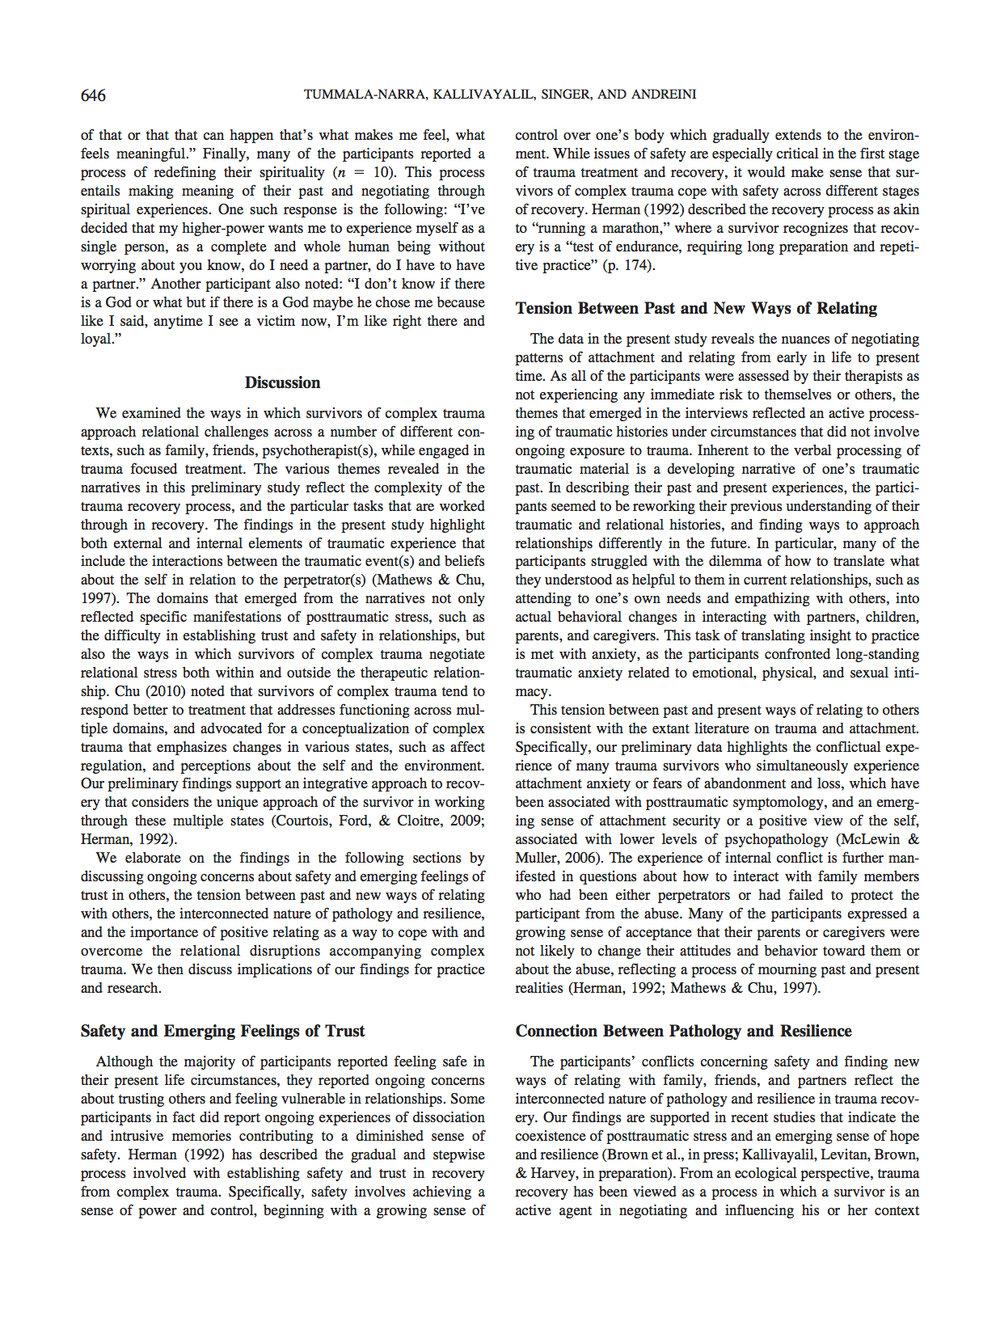 paper p7.jpg